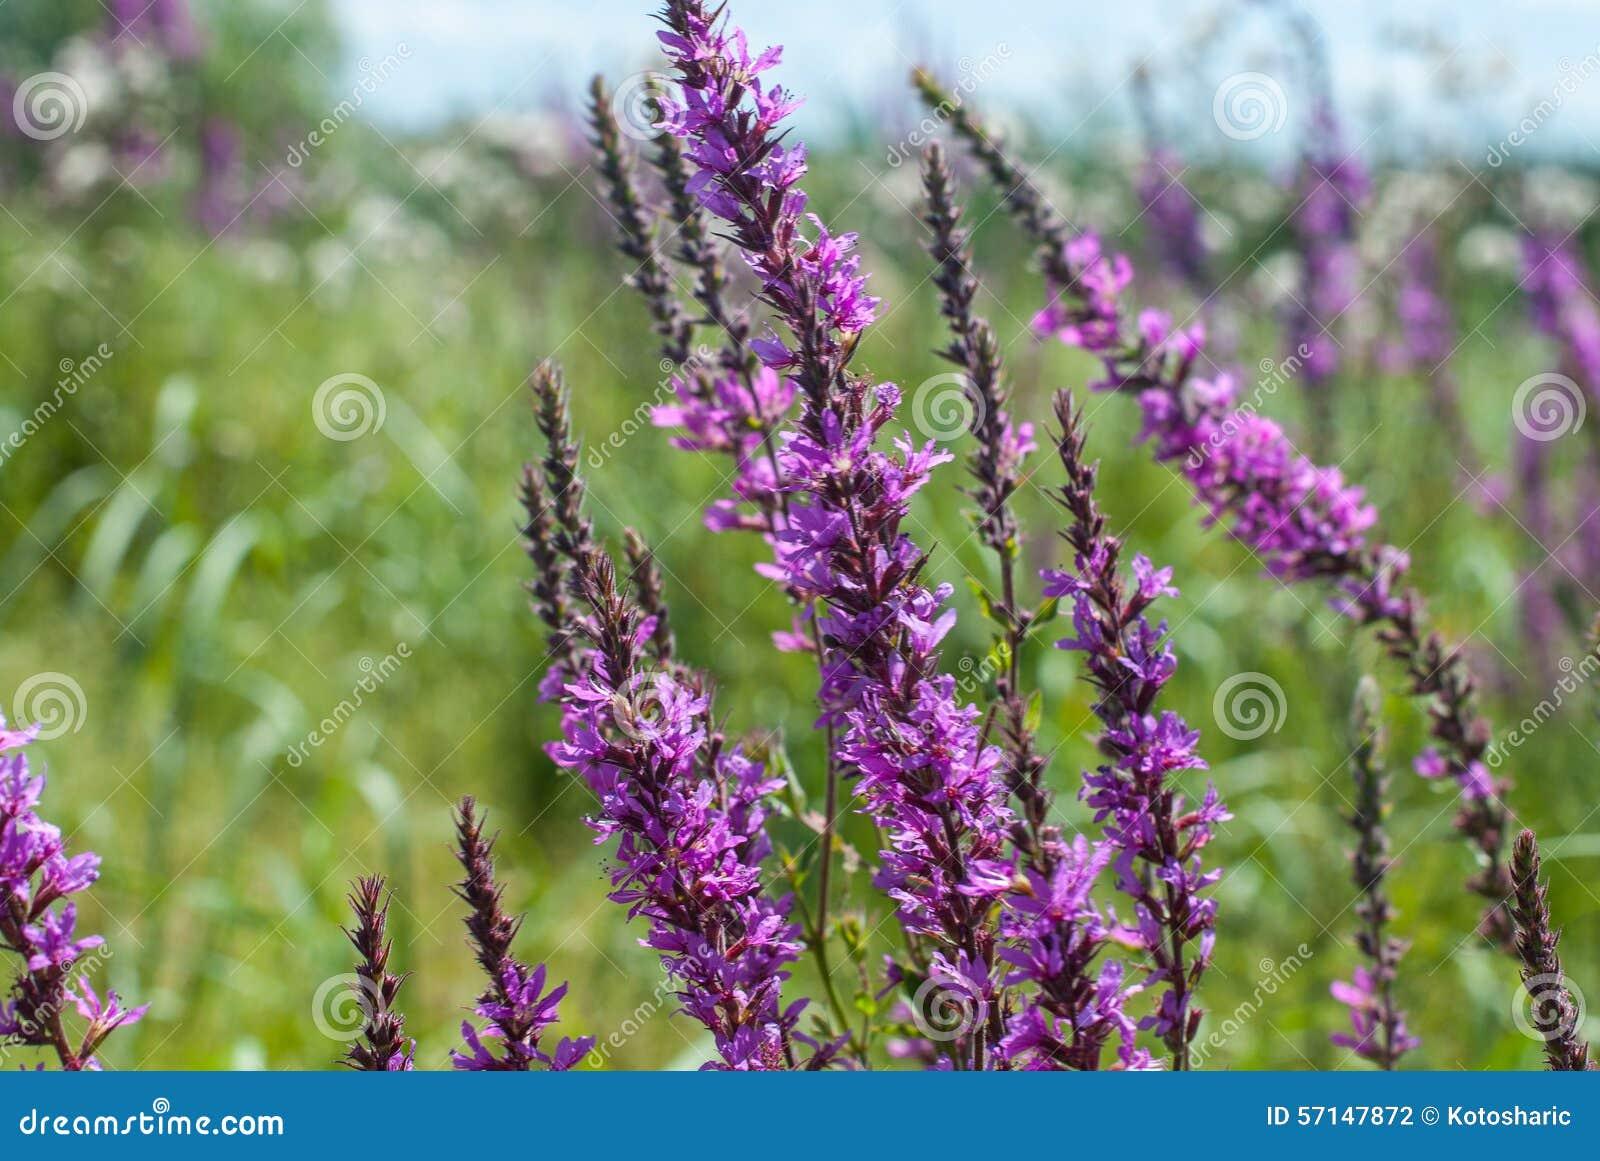 Beautiful Purple Wild Flowers Stock Photo Image Of Foreground